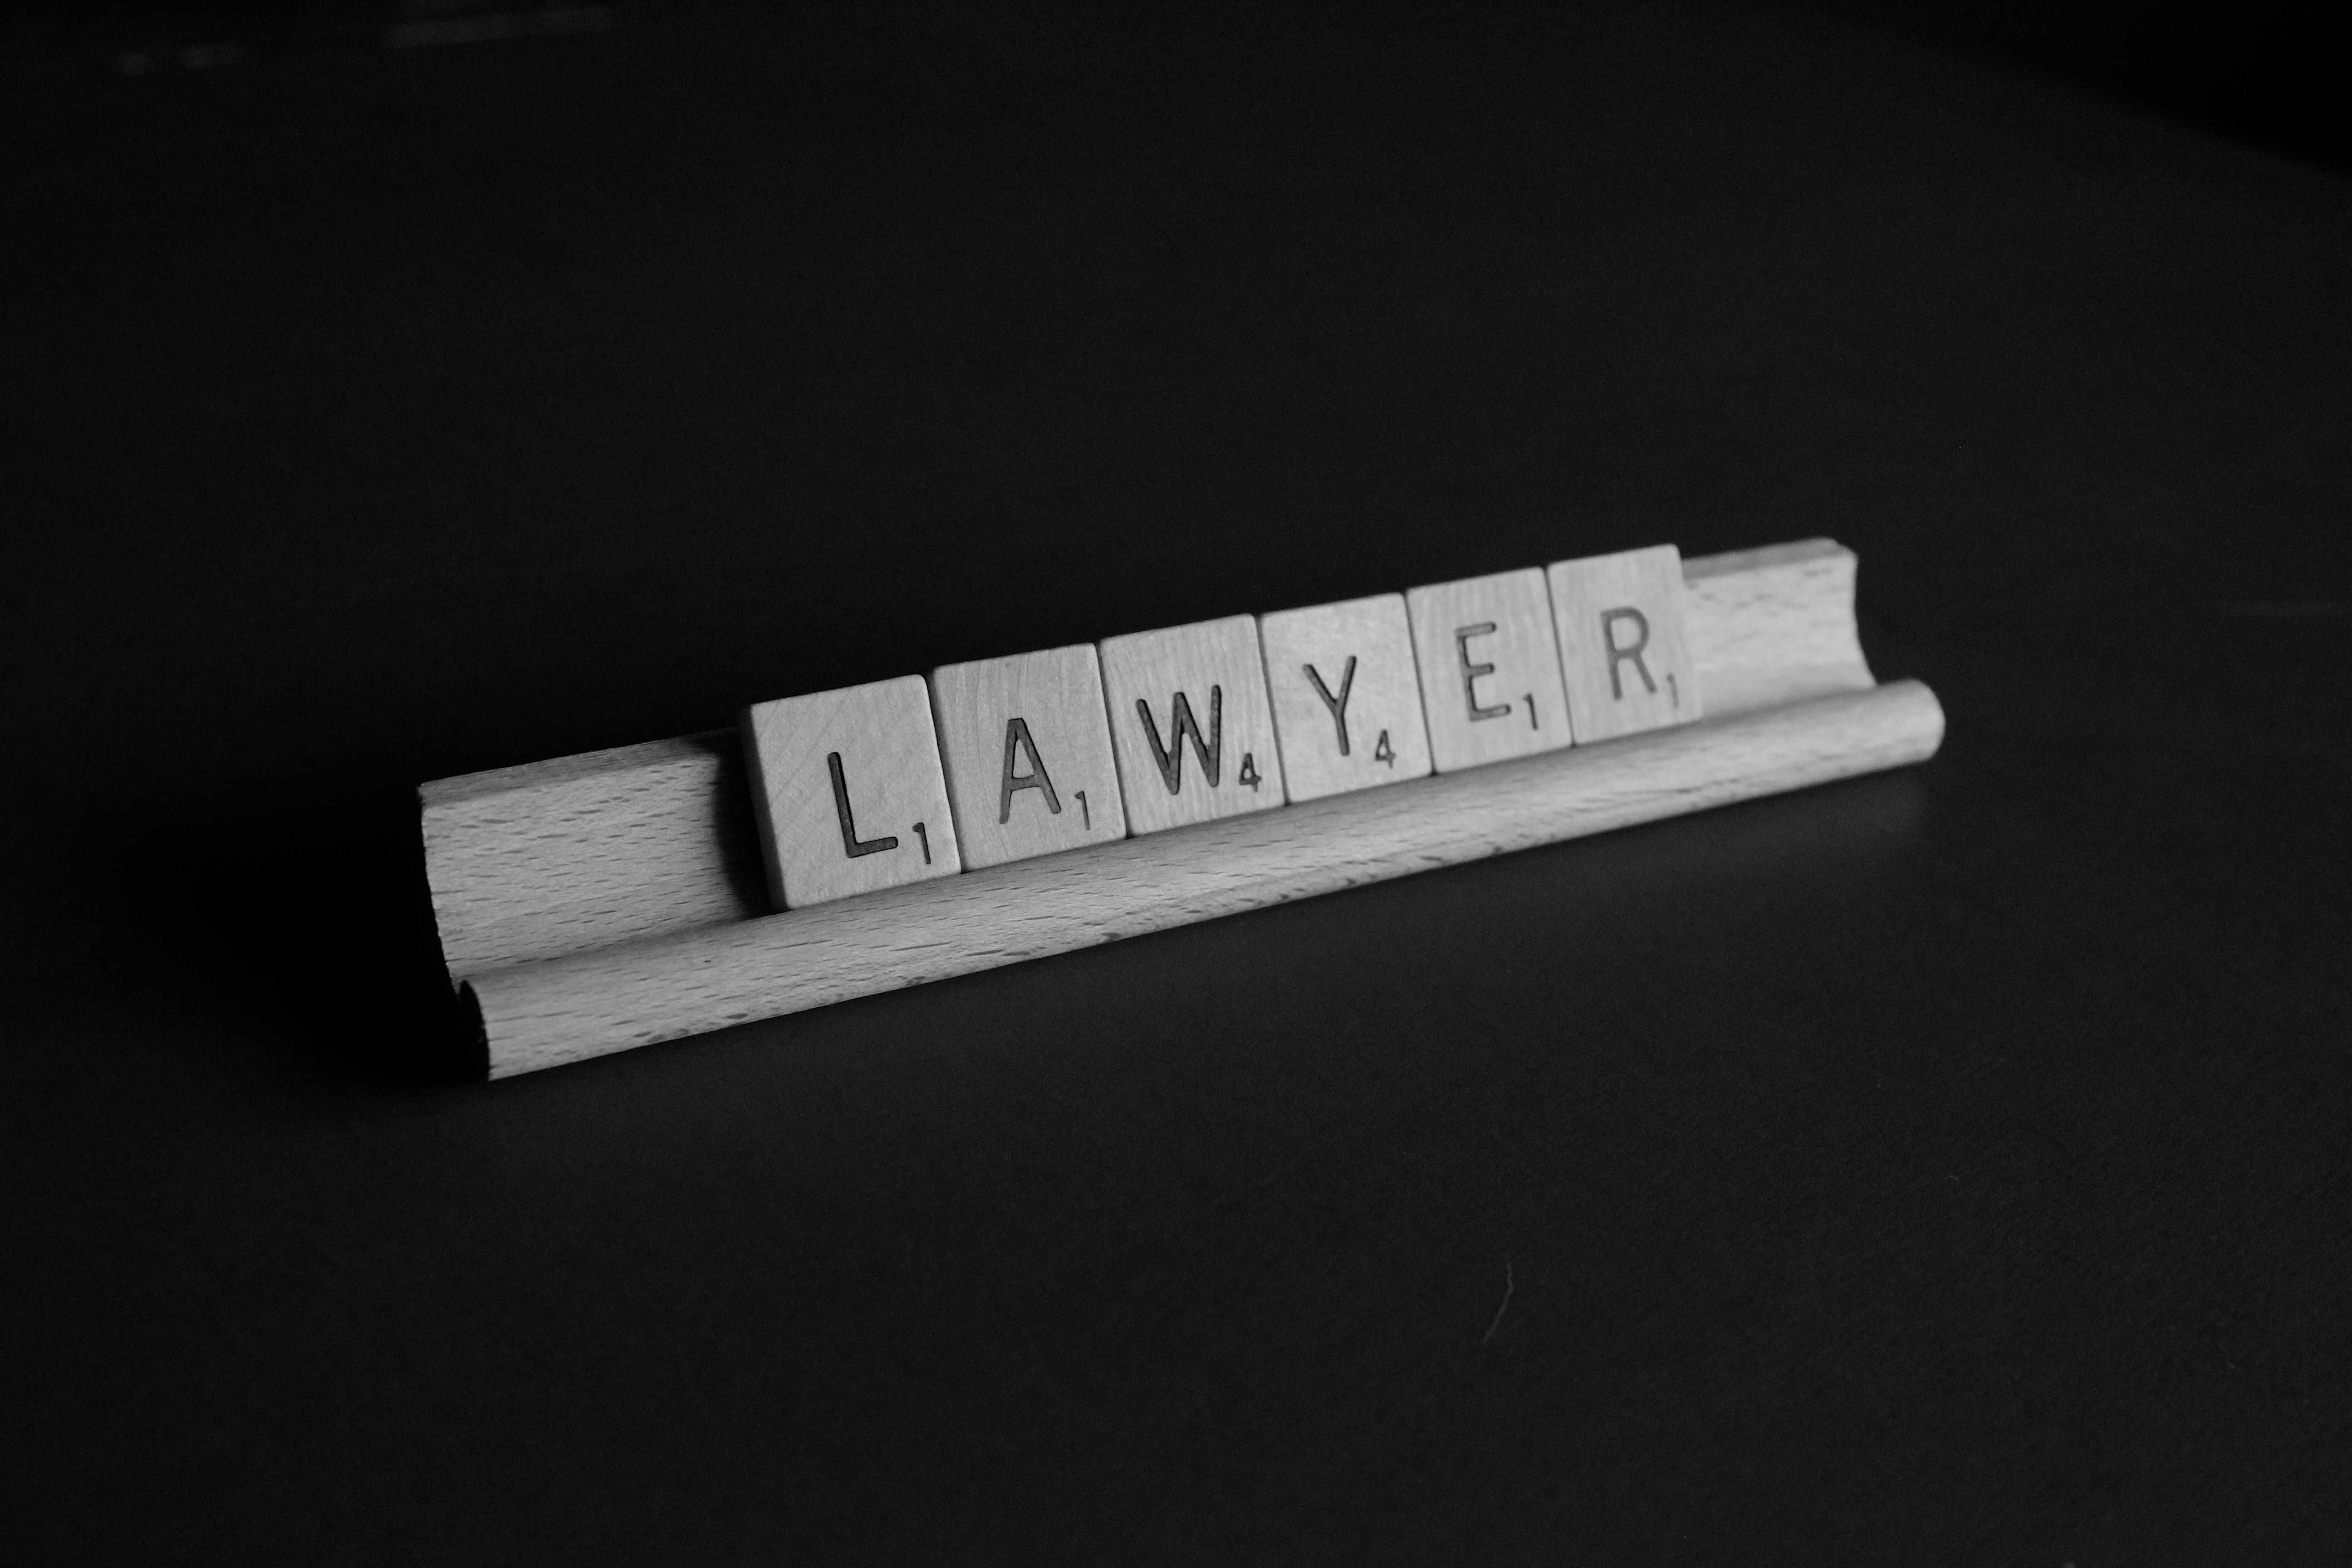 Other legal activities in Tallinn